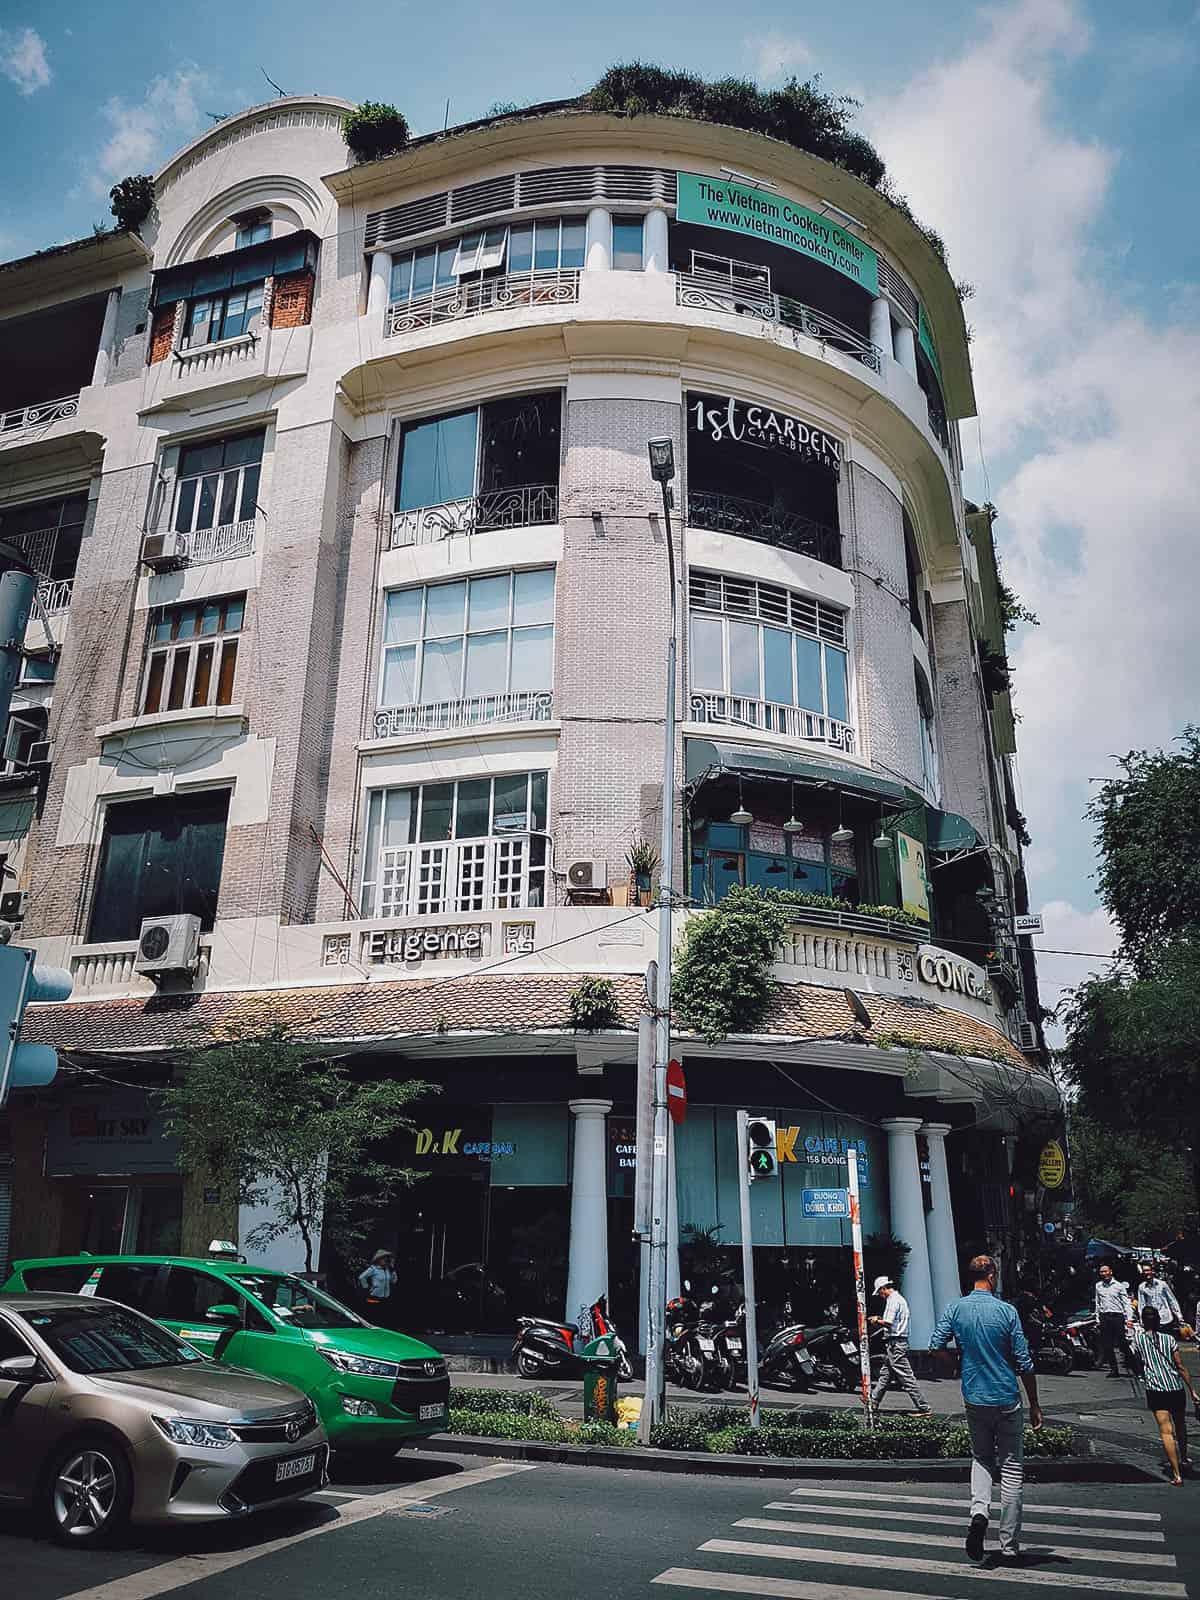 Black coffee at Bang Khuang Cafe